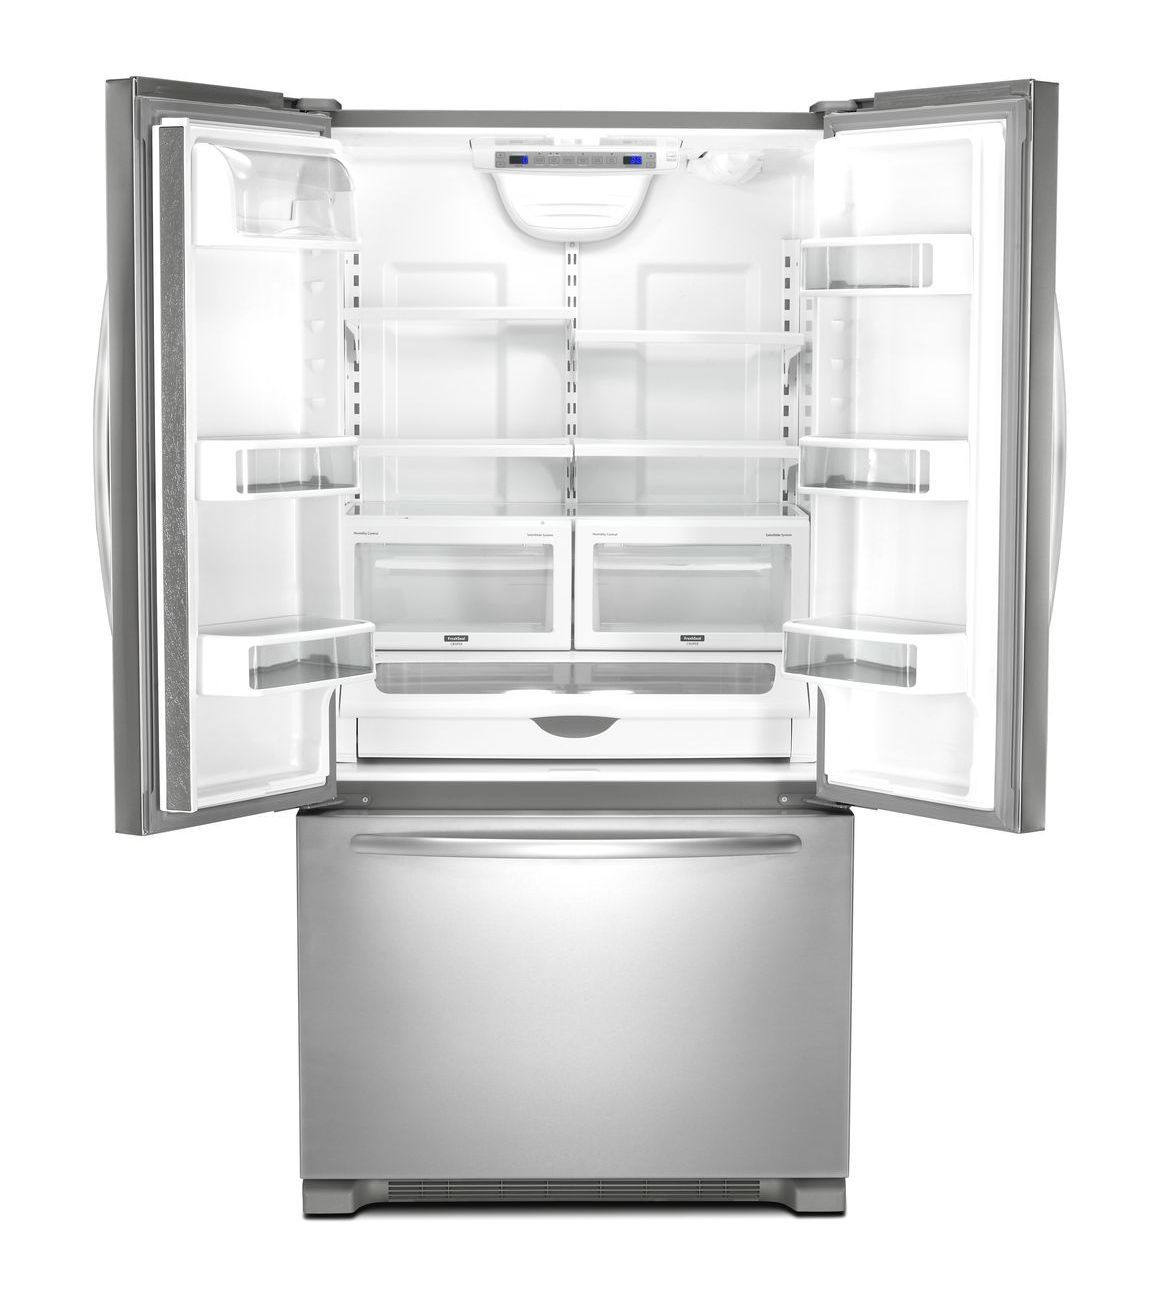 Charming KitchenAid® 22 Cu. Ft. Counter Depth French Door Refrigerator, Architect®